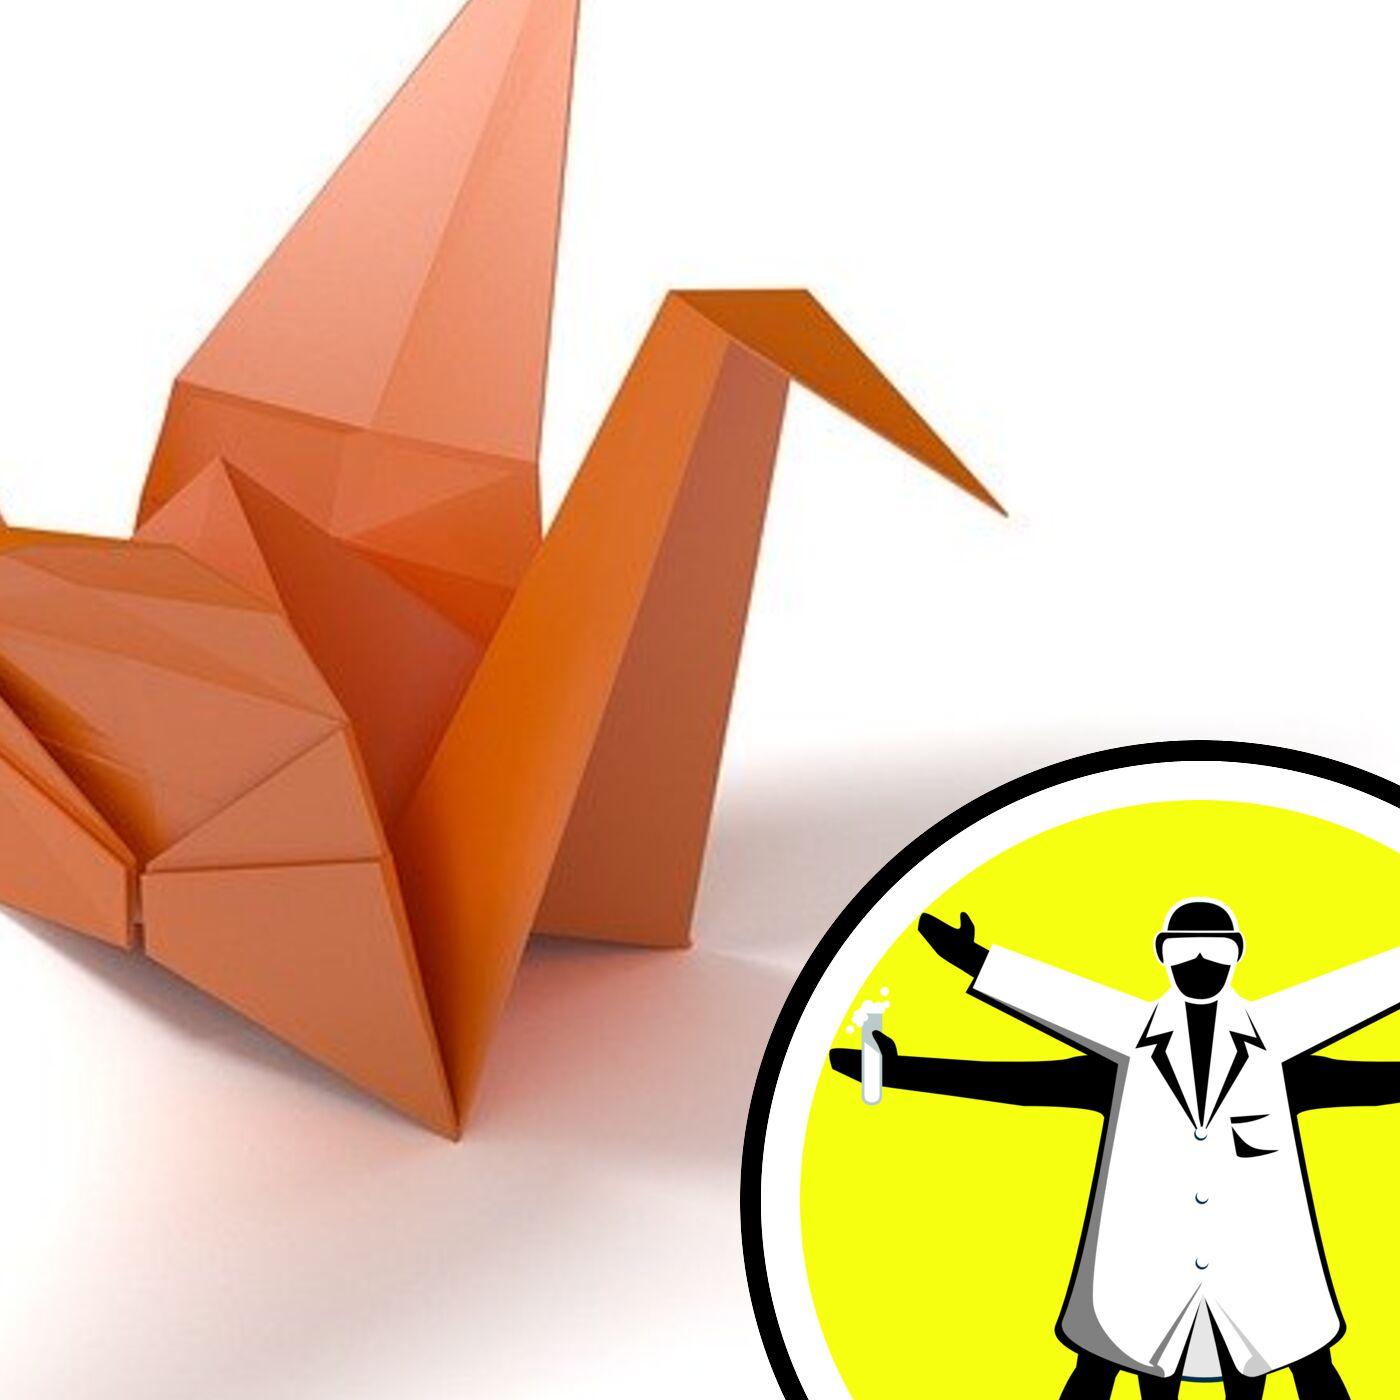 Crisp Packet Keyrings | Enterprise ideas, Keyrings, Diy keyring | 1400x1400